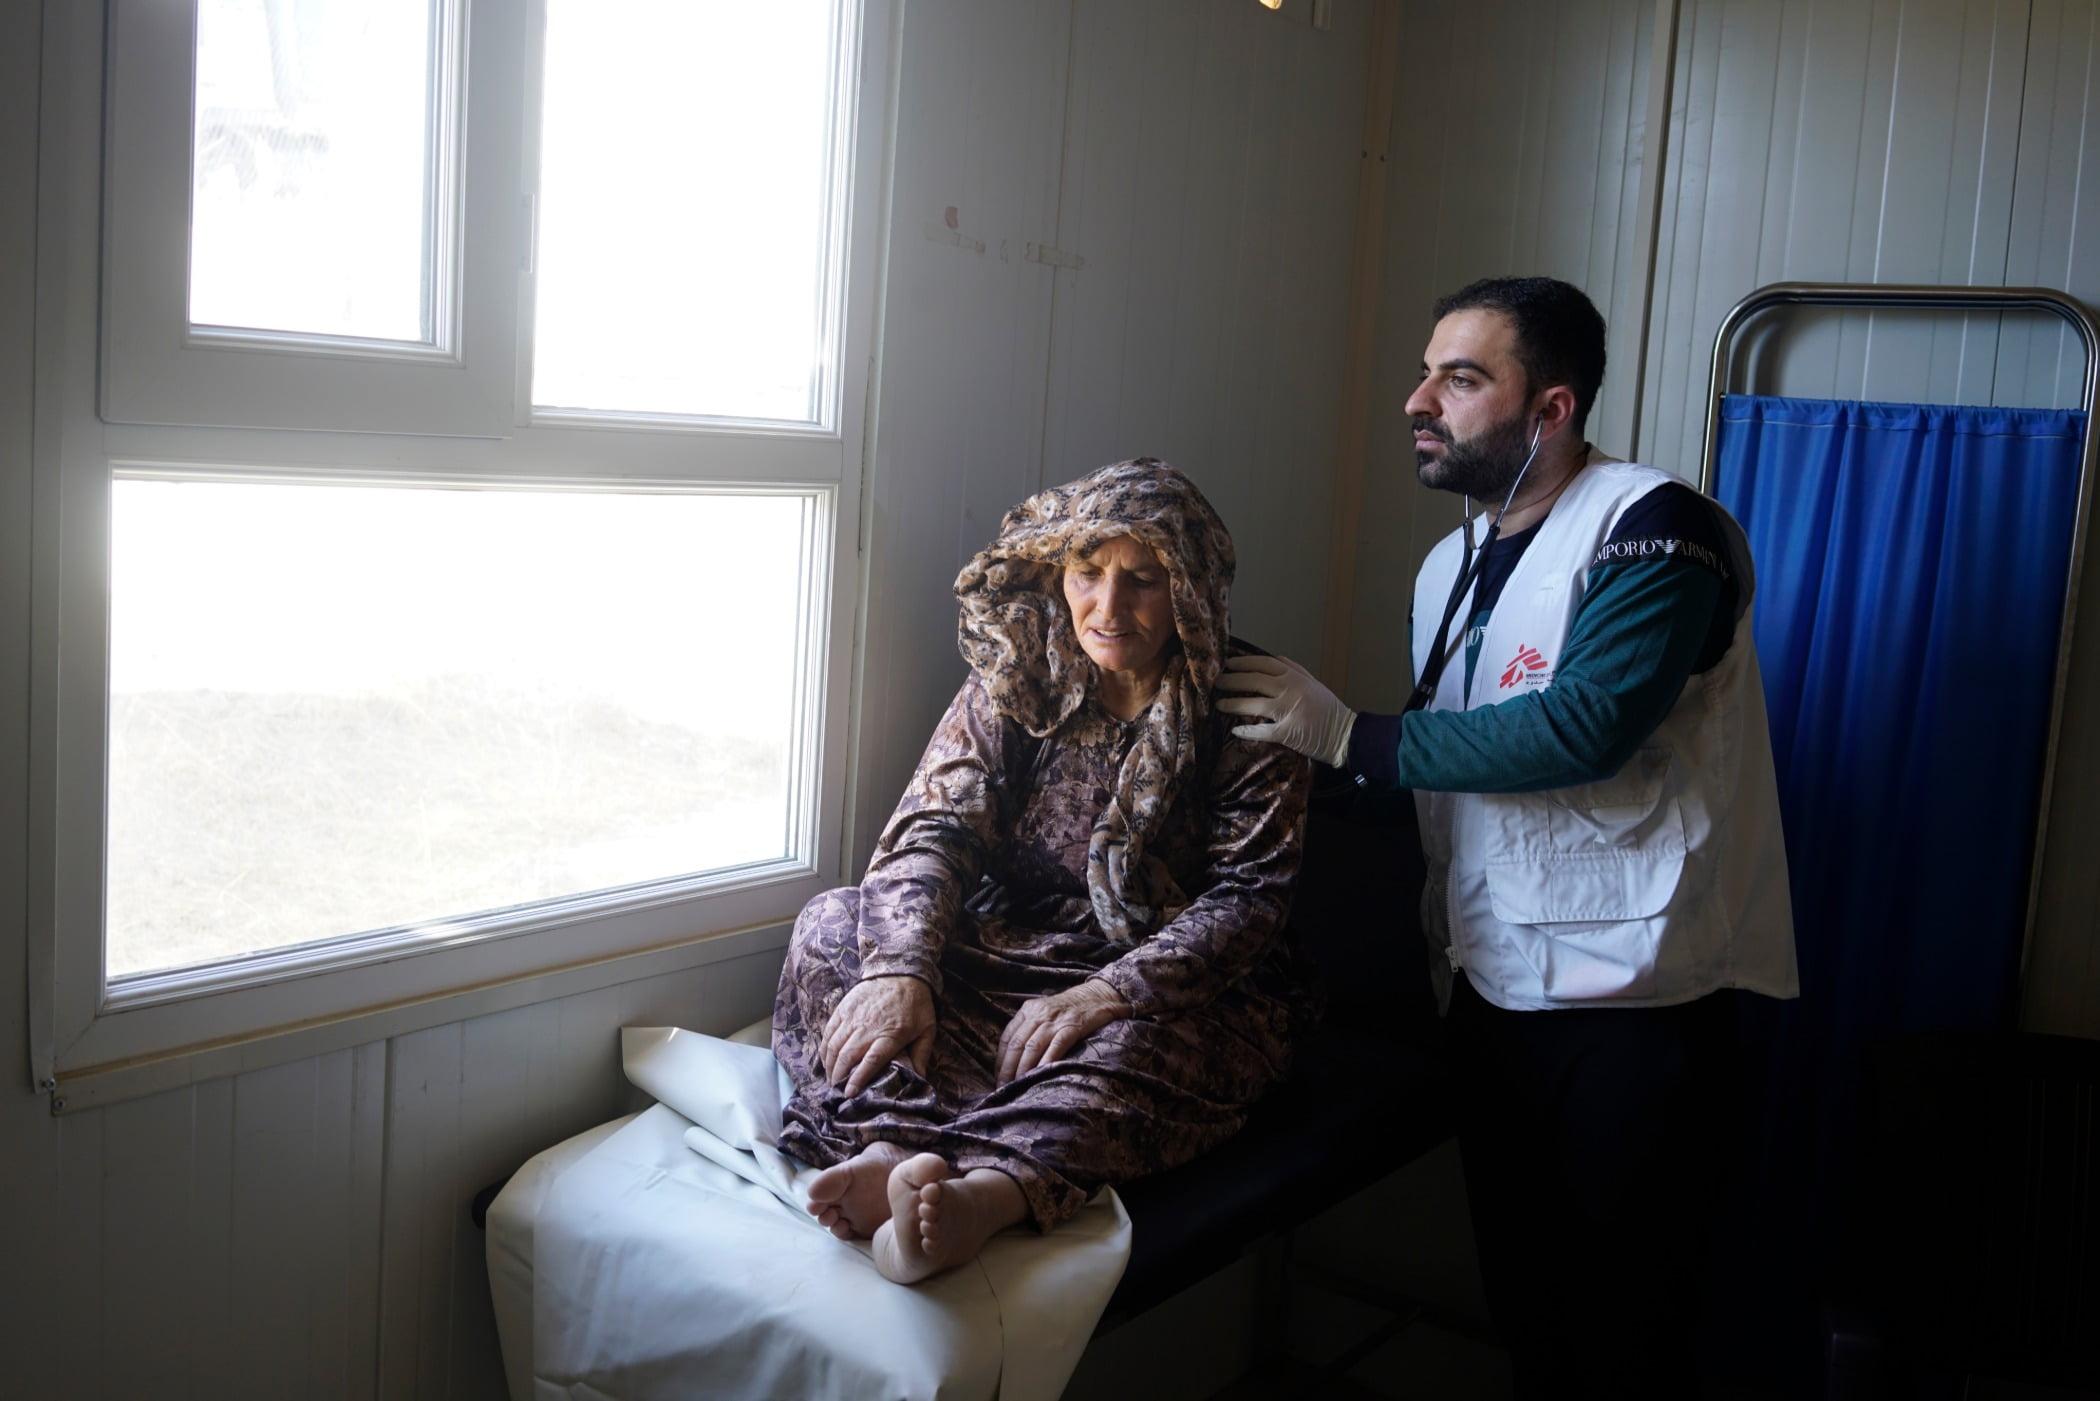 Flash photography, Window, Leg, Comfort, Textile, Beard, Wood